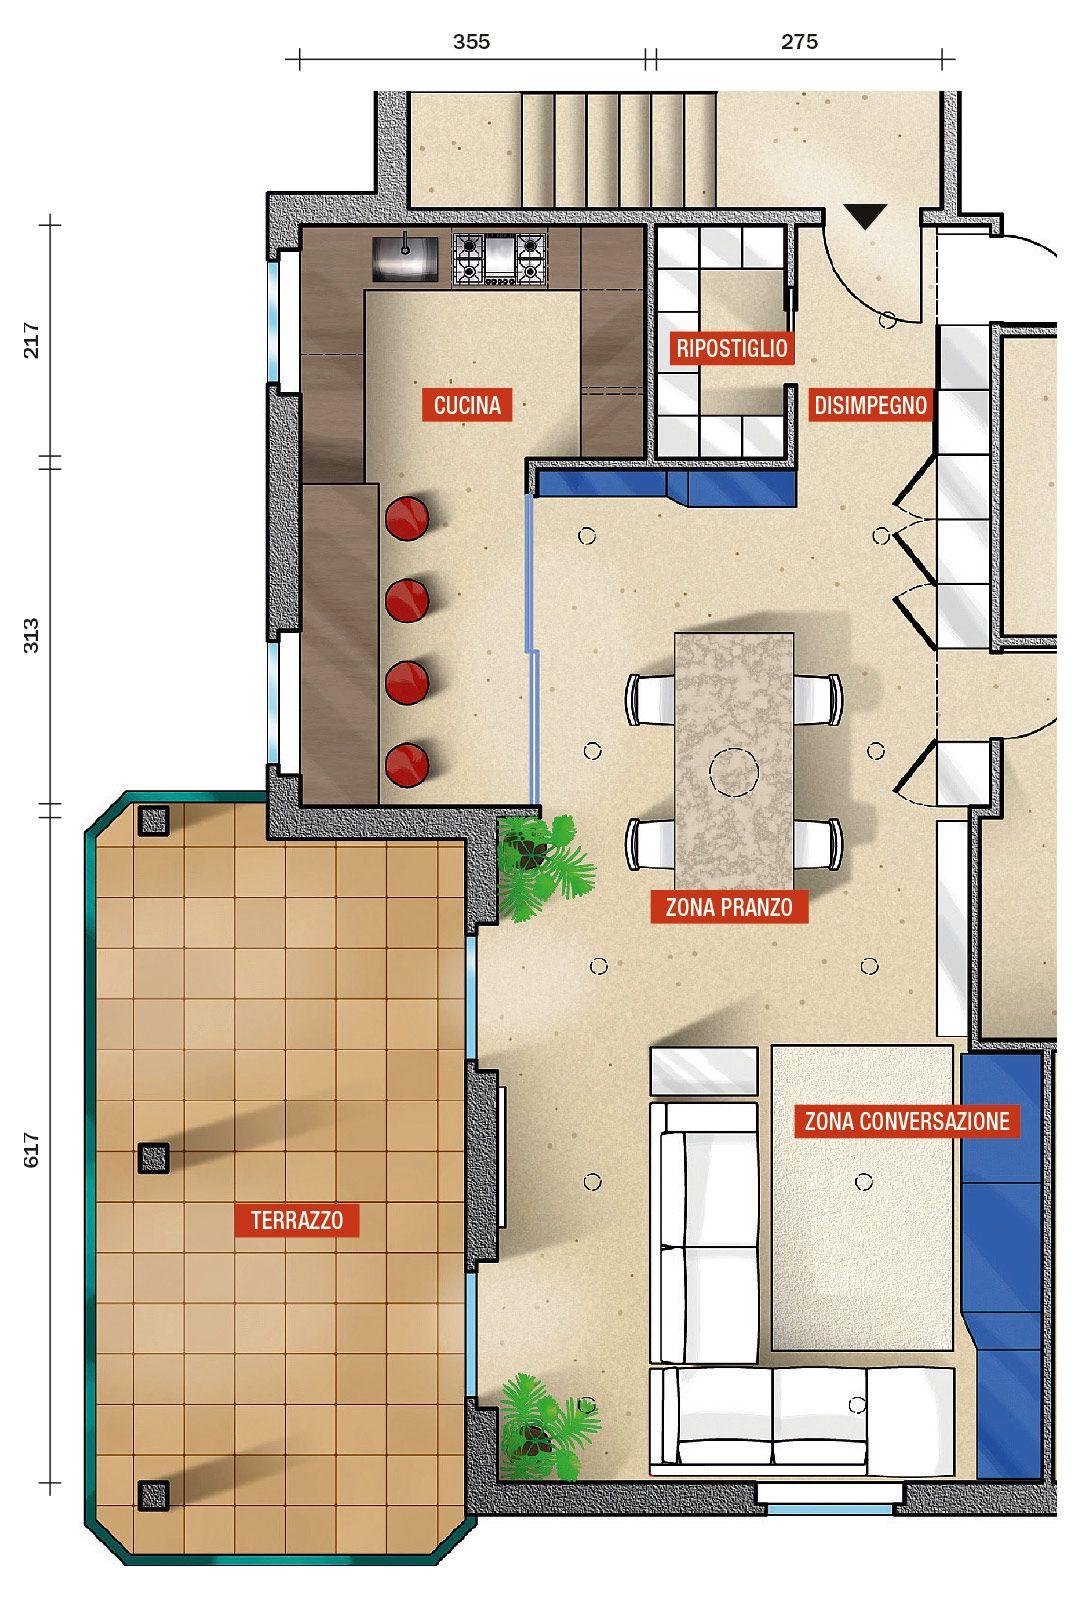 PROGETTO-CUCINA-1(SPECIALE) | arredamento | Pinterest | Cucina ...